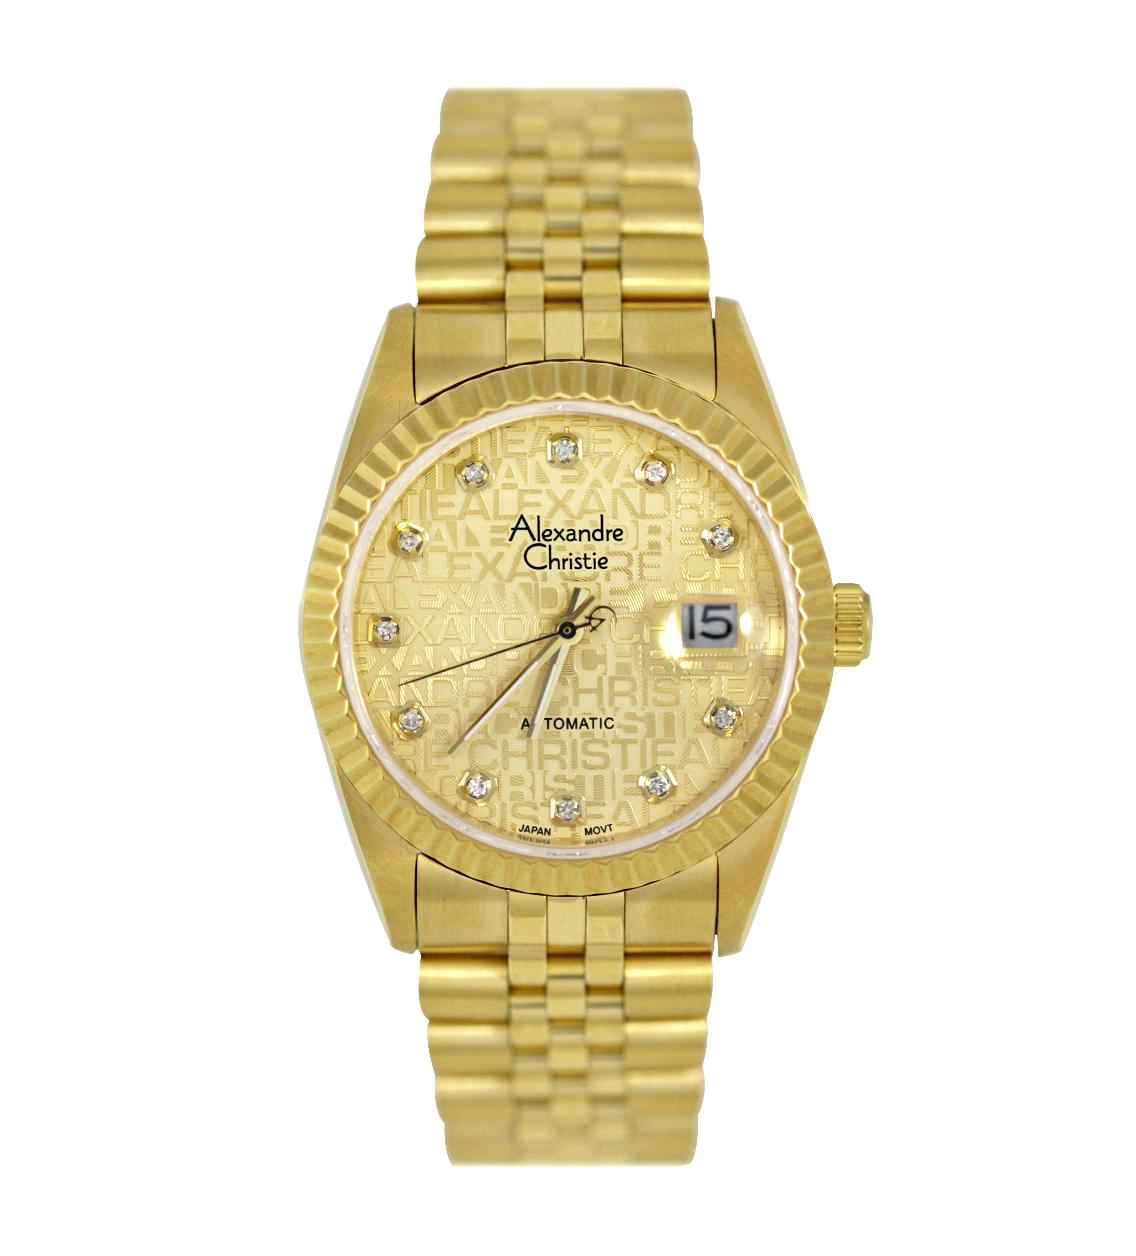 Đồng hồ Alexandre Christie nam 8A138M